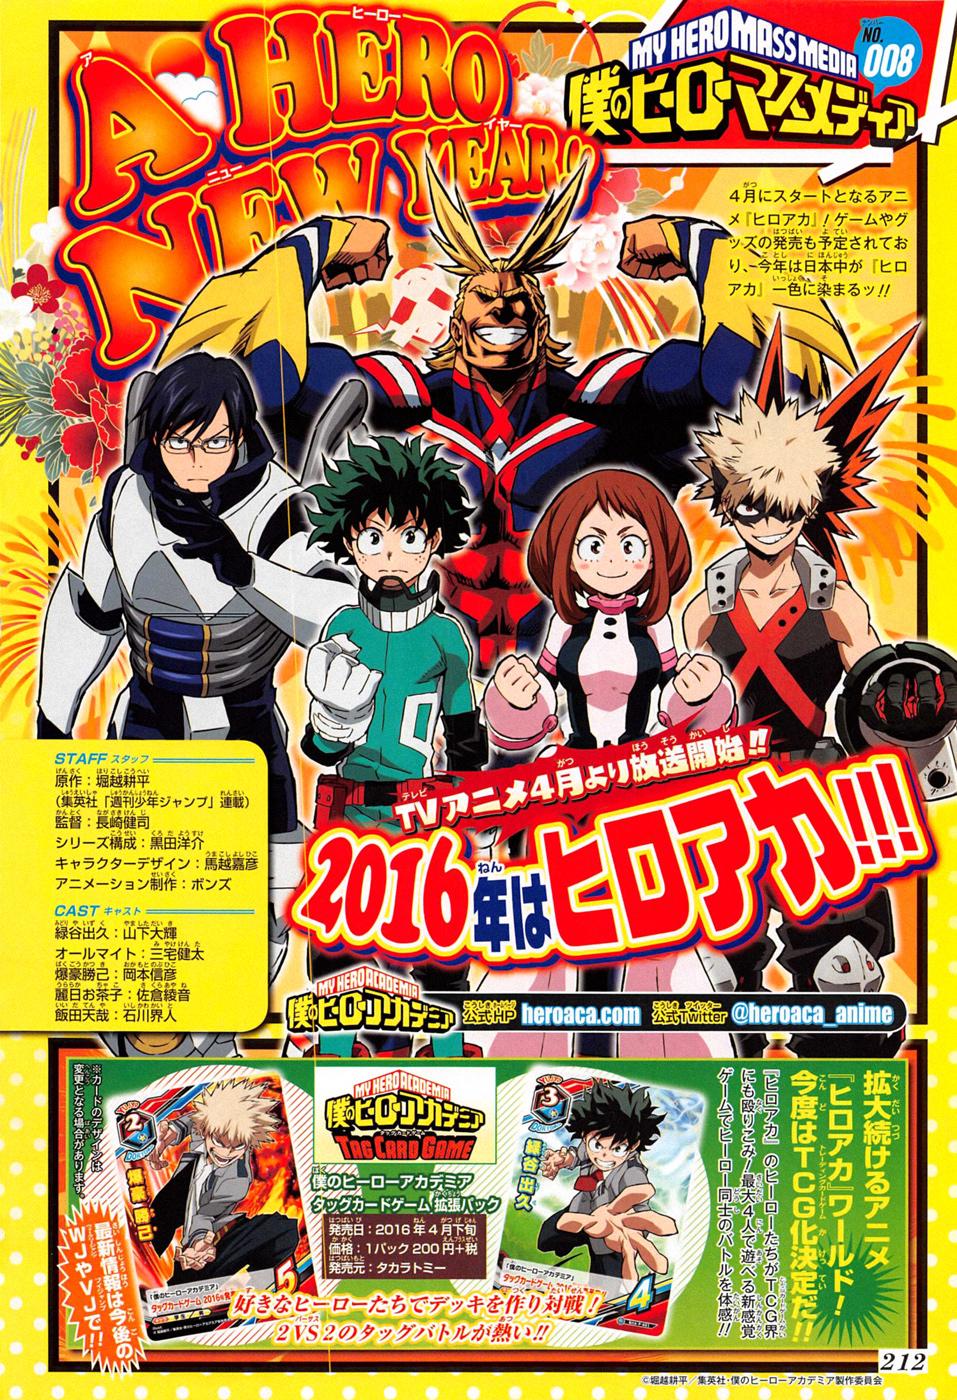 http://c5.ninemanga.com/es_manga/54/182/435094/a4096020ac6ba30a2518dec38a749839.jpg Page 4